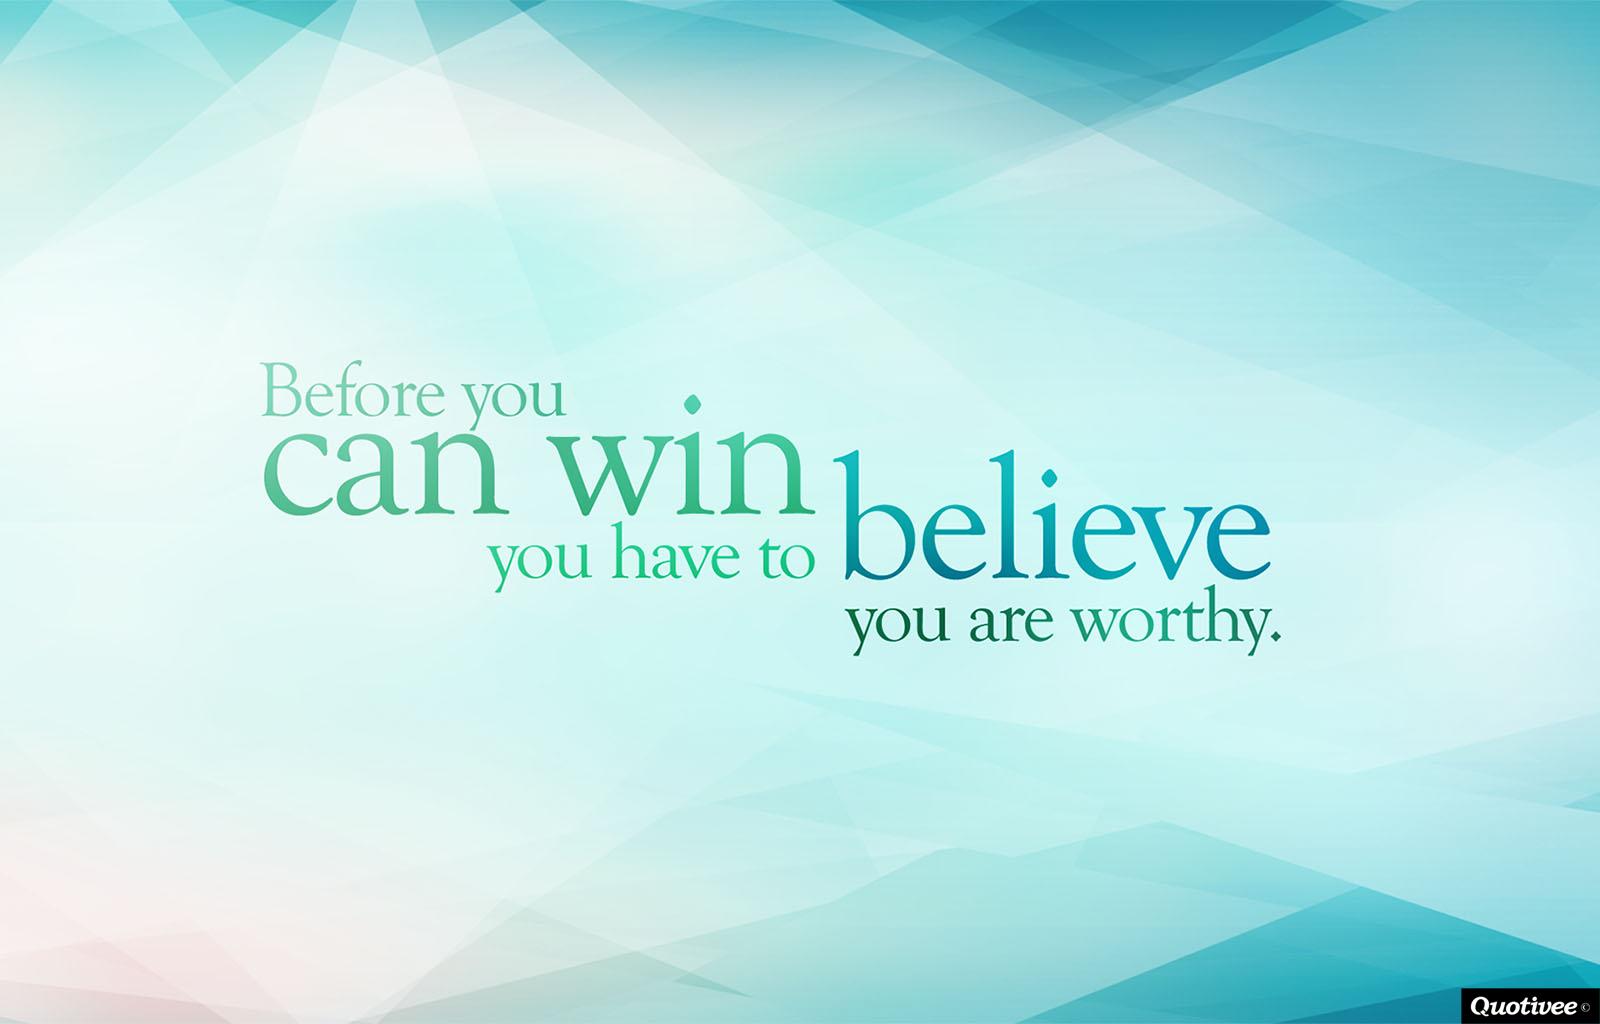 Motivational Wallpapers 46xm957 1280x1280: Tumblr Wallpaper Quotes